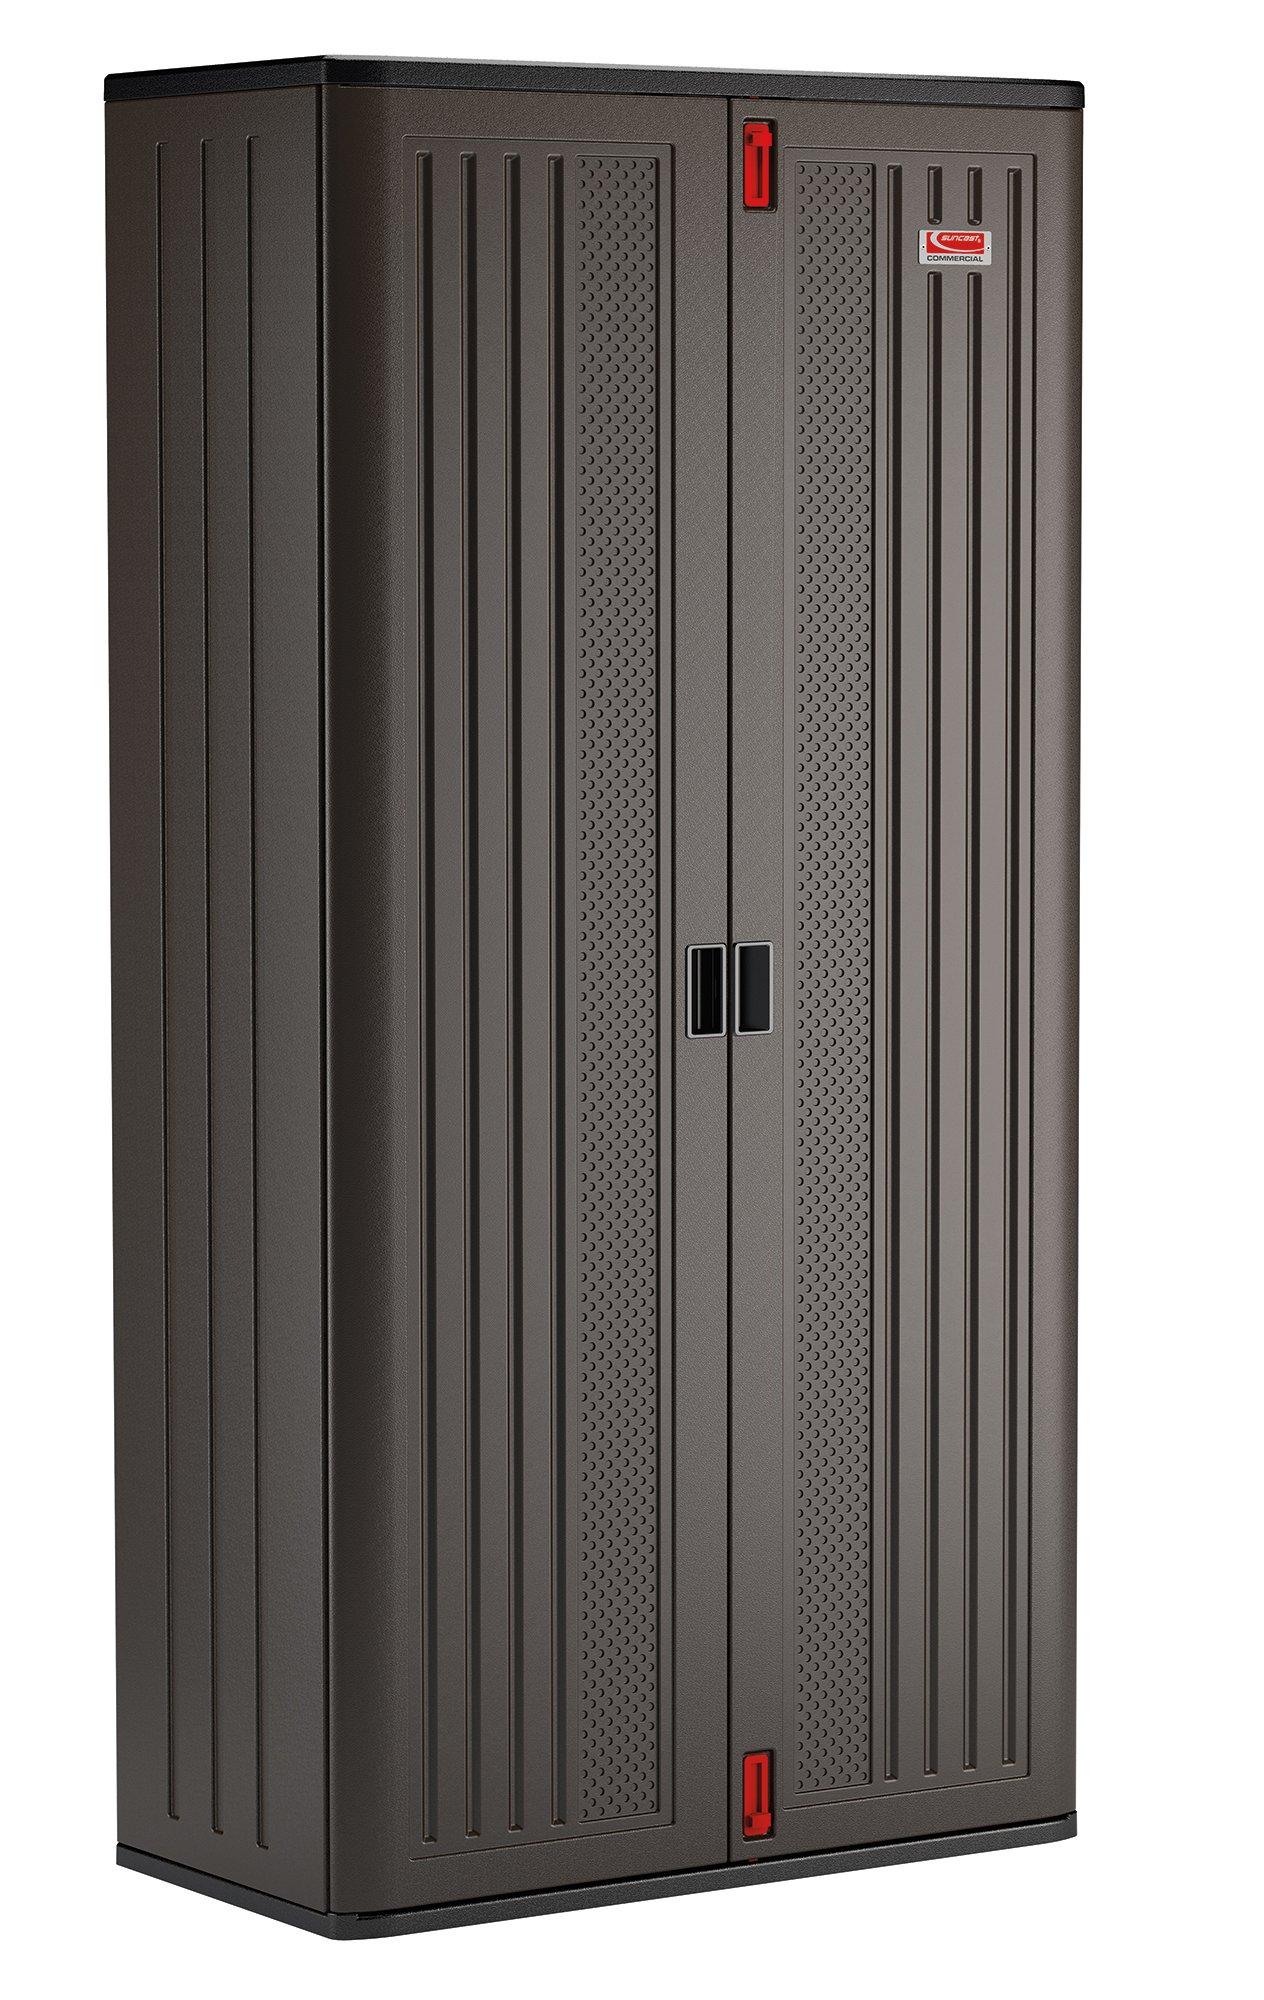 Suncast Commercial Blow Molded Mega Tall Cabinet in 4 Shelf